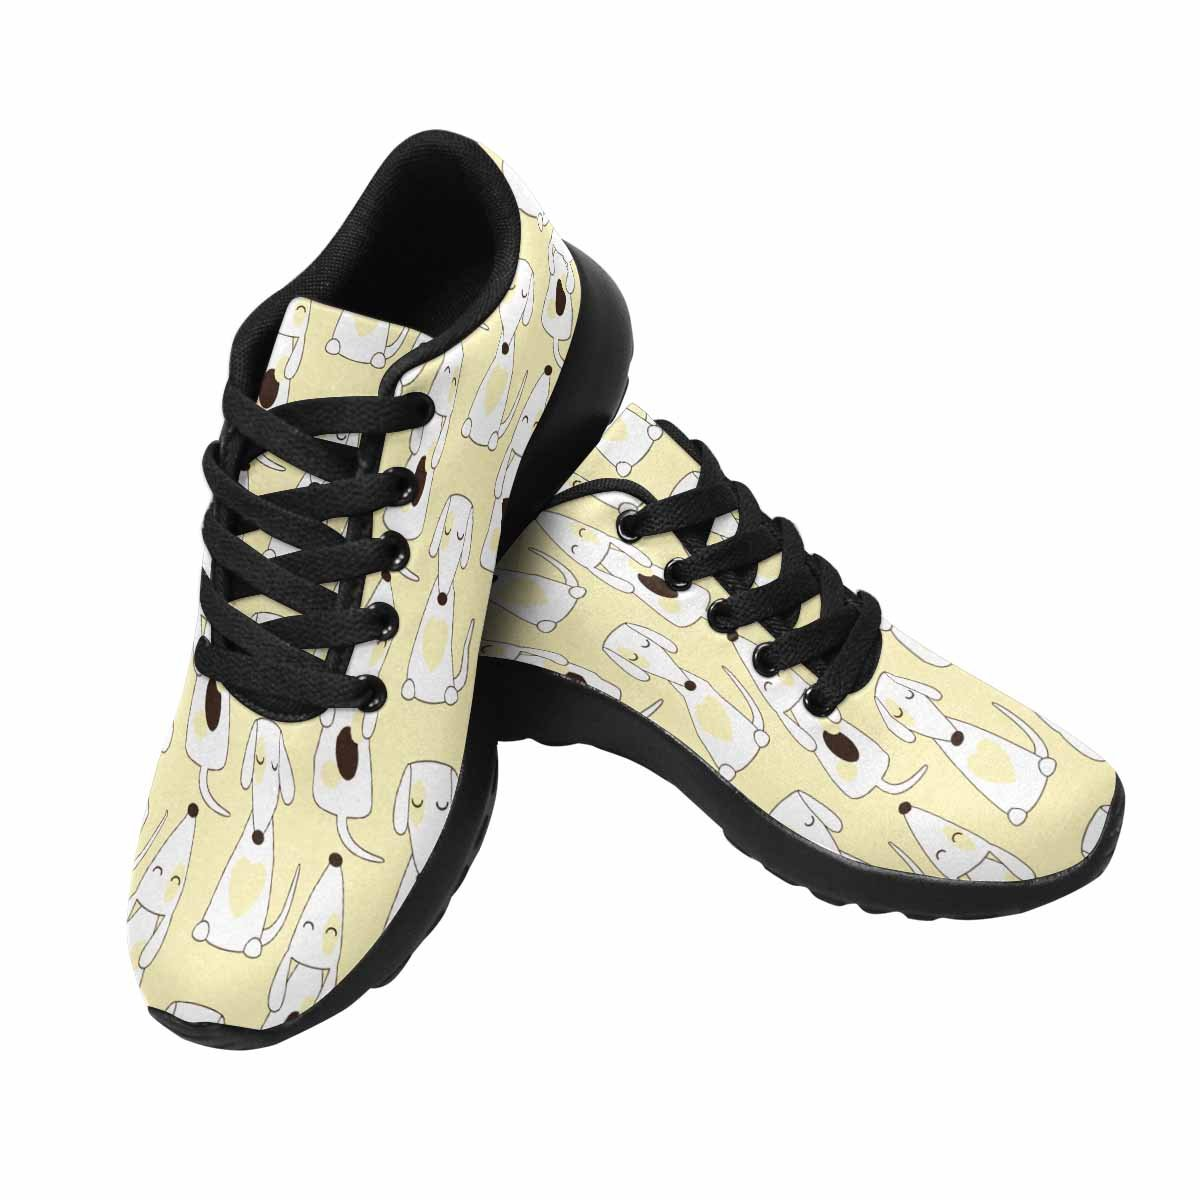 InterestPrint Women's Go Easy Walking Comfort Sports Athletic Shoes Jack Russel Terrier US 7